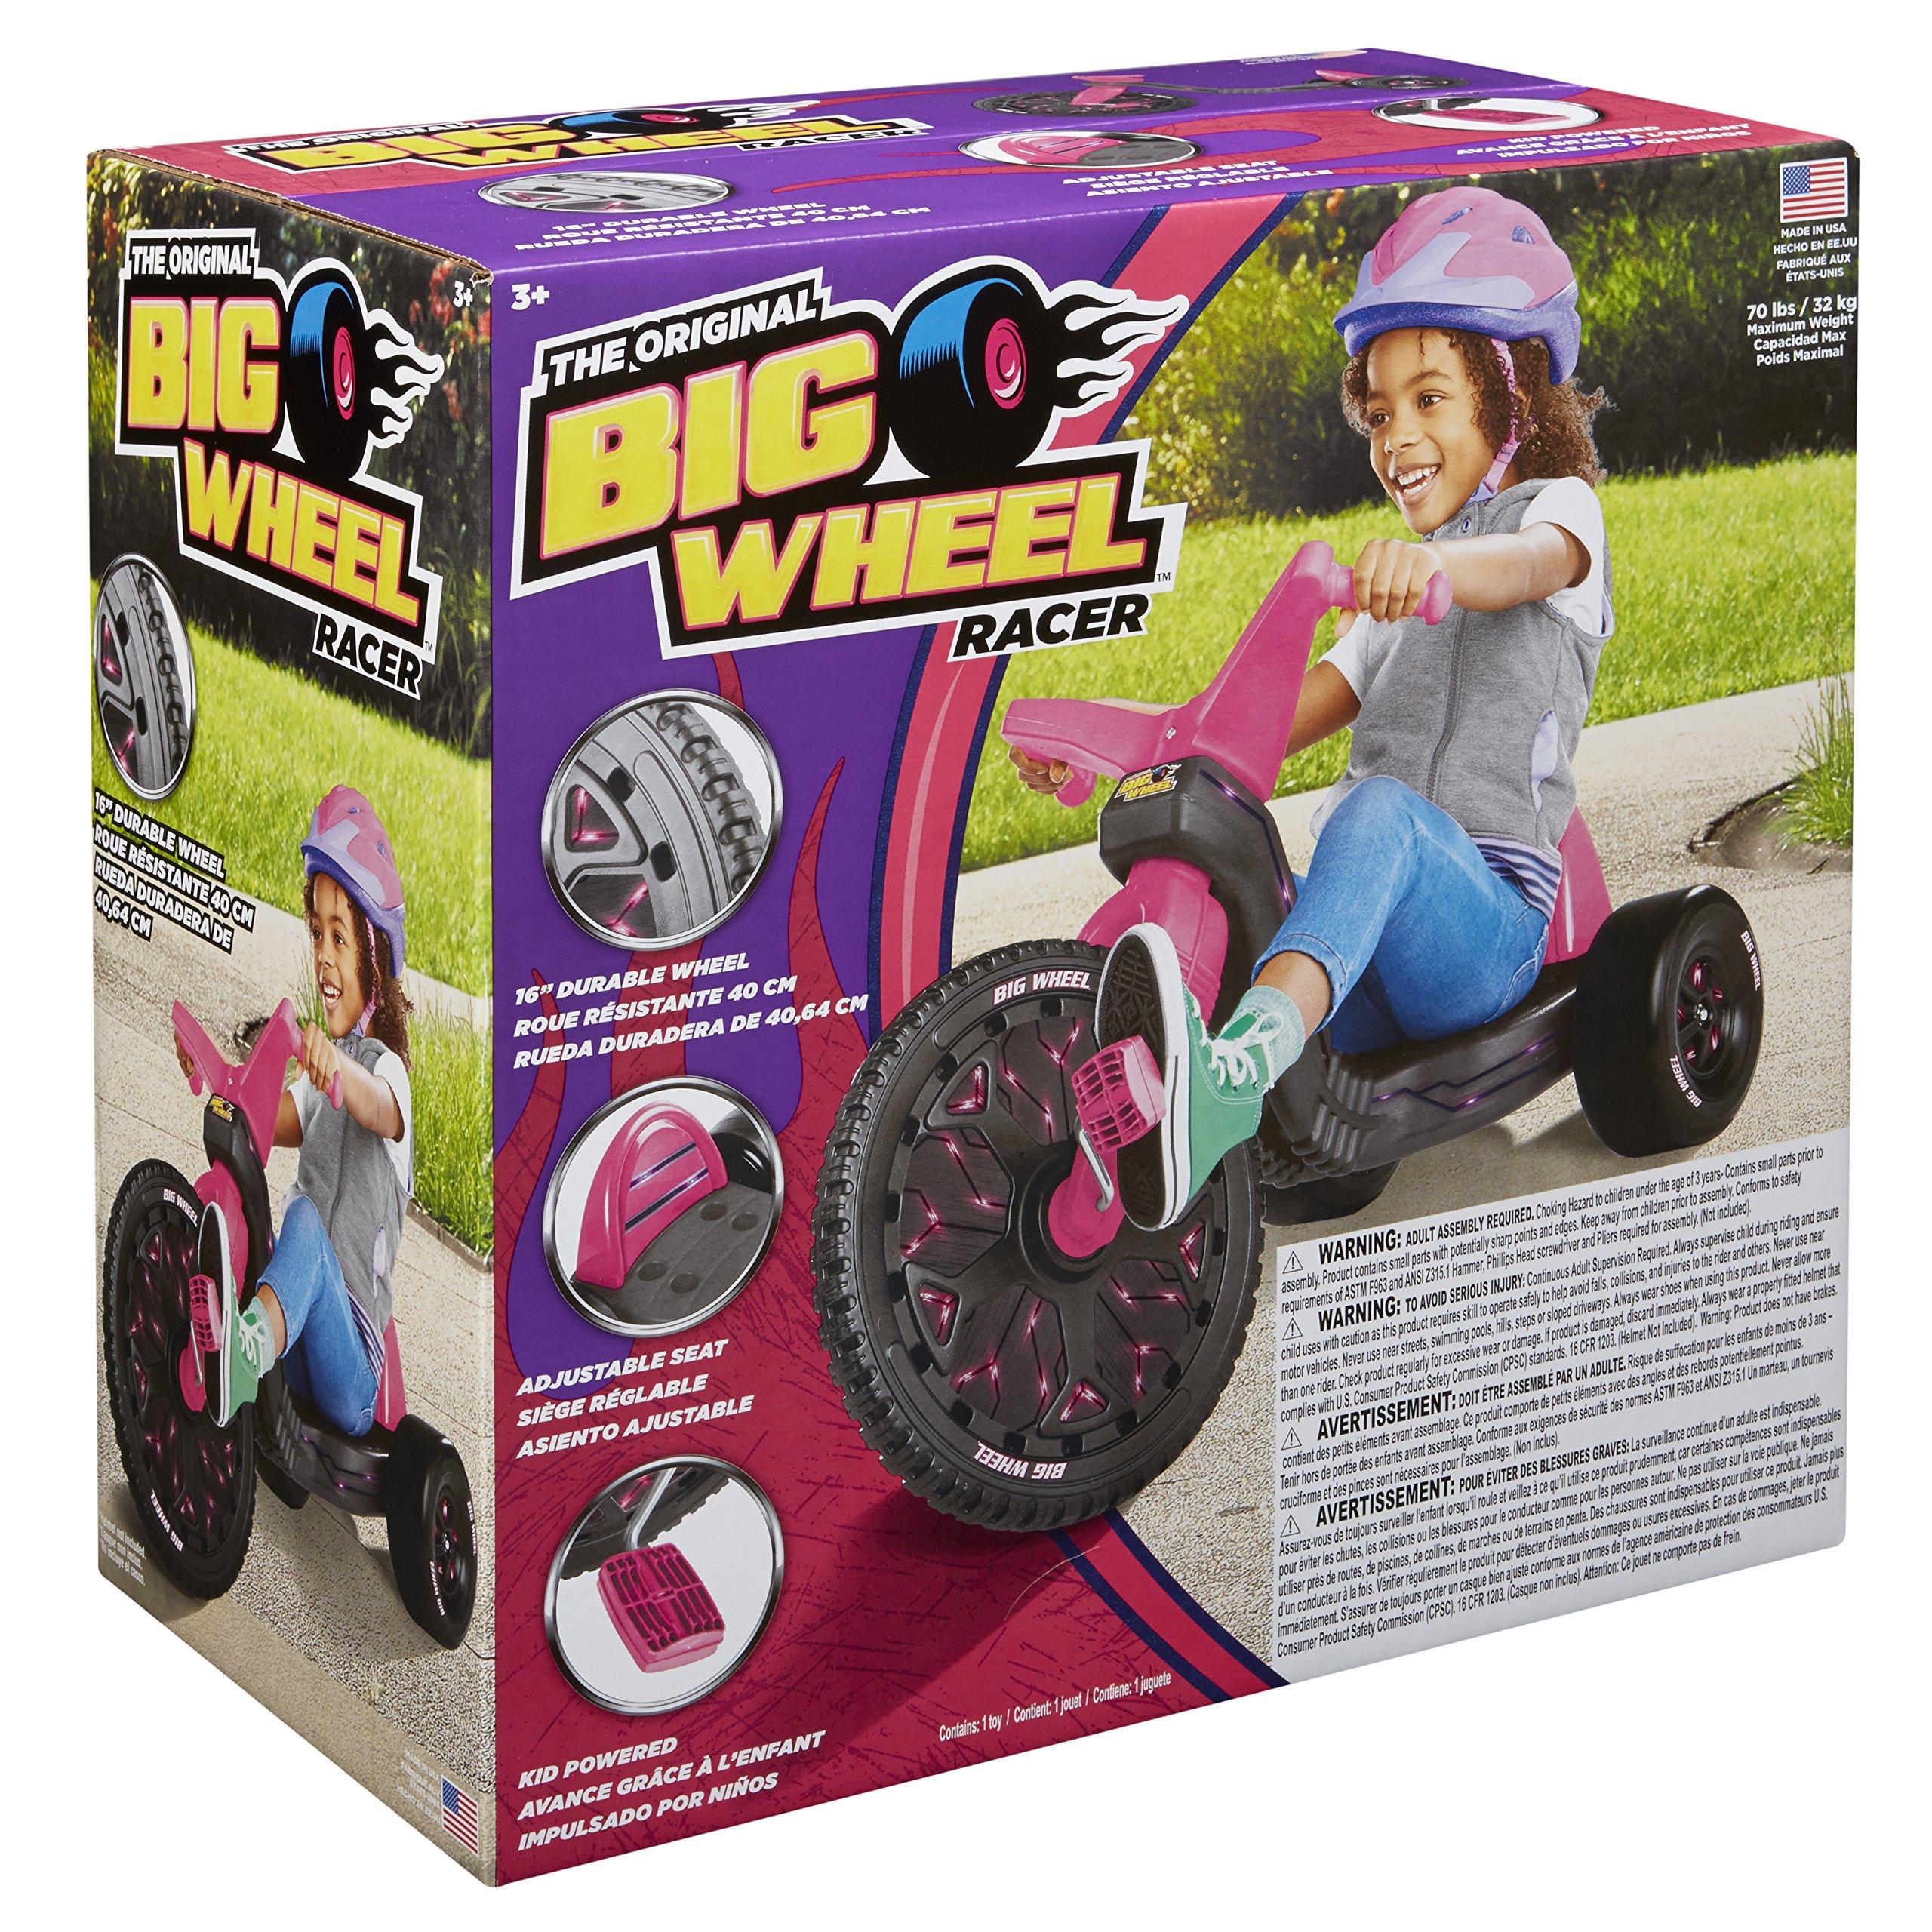 Big Wheel 16in, Pink, 13.5-Pound by Big Wheel